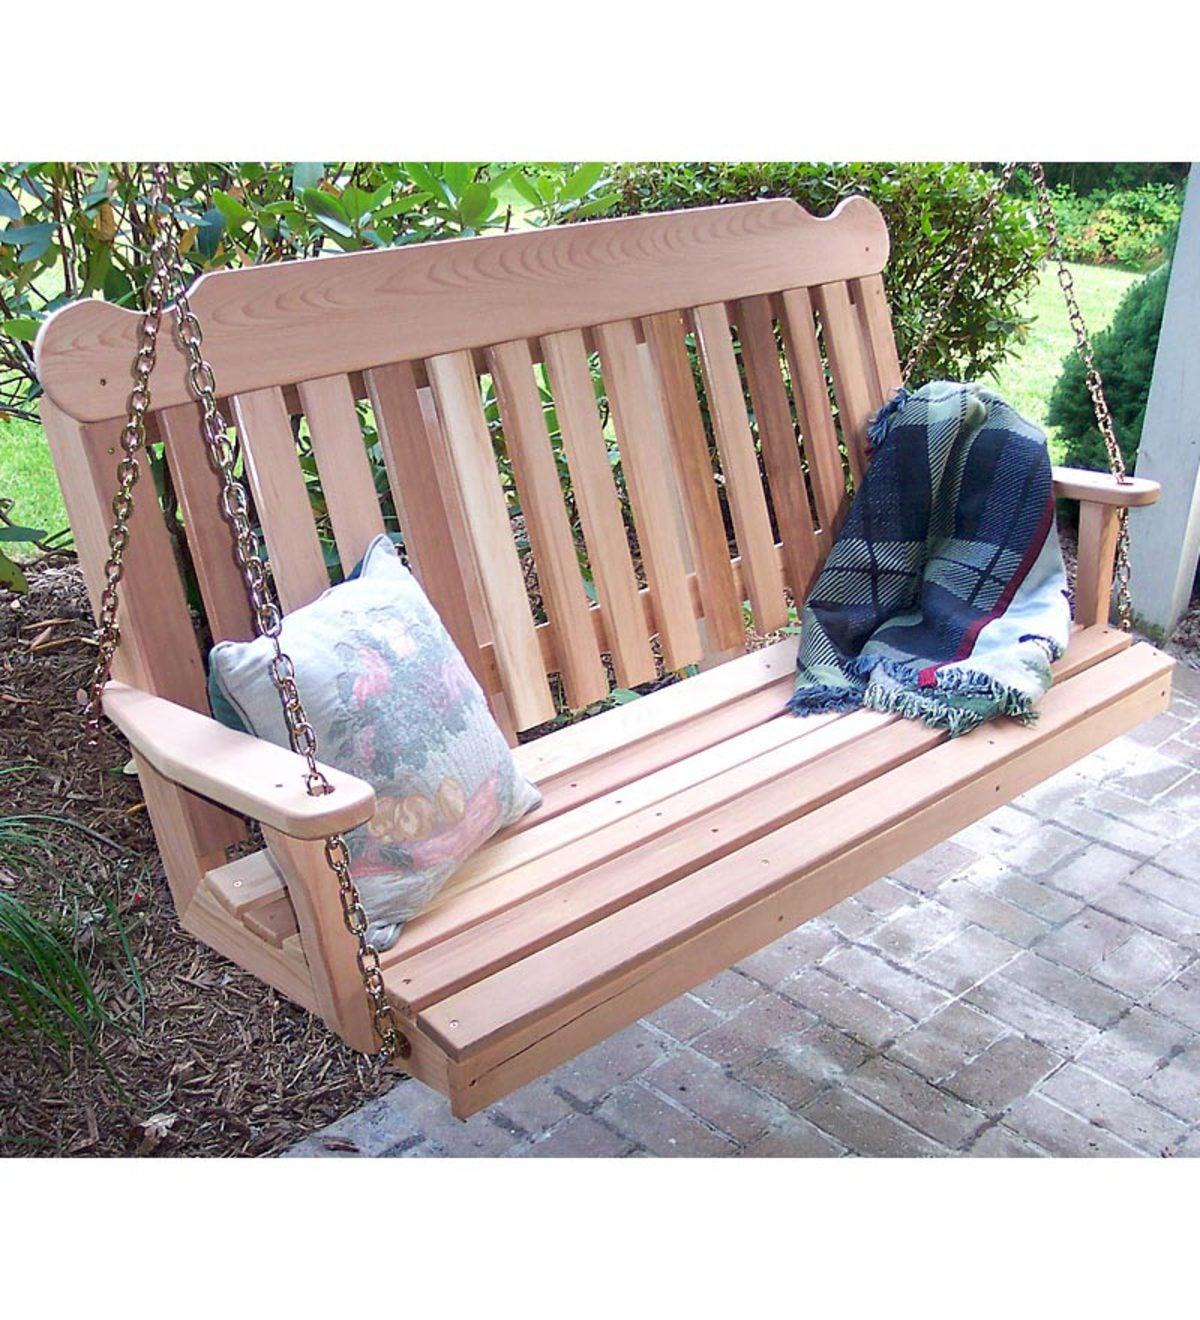 6 Ft USA Made Western Red Cedar Porch Swing